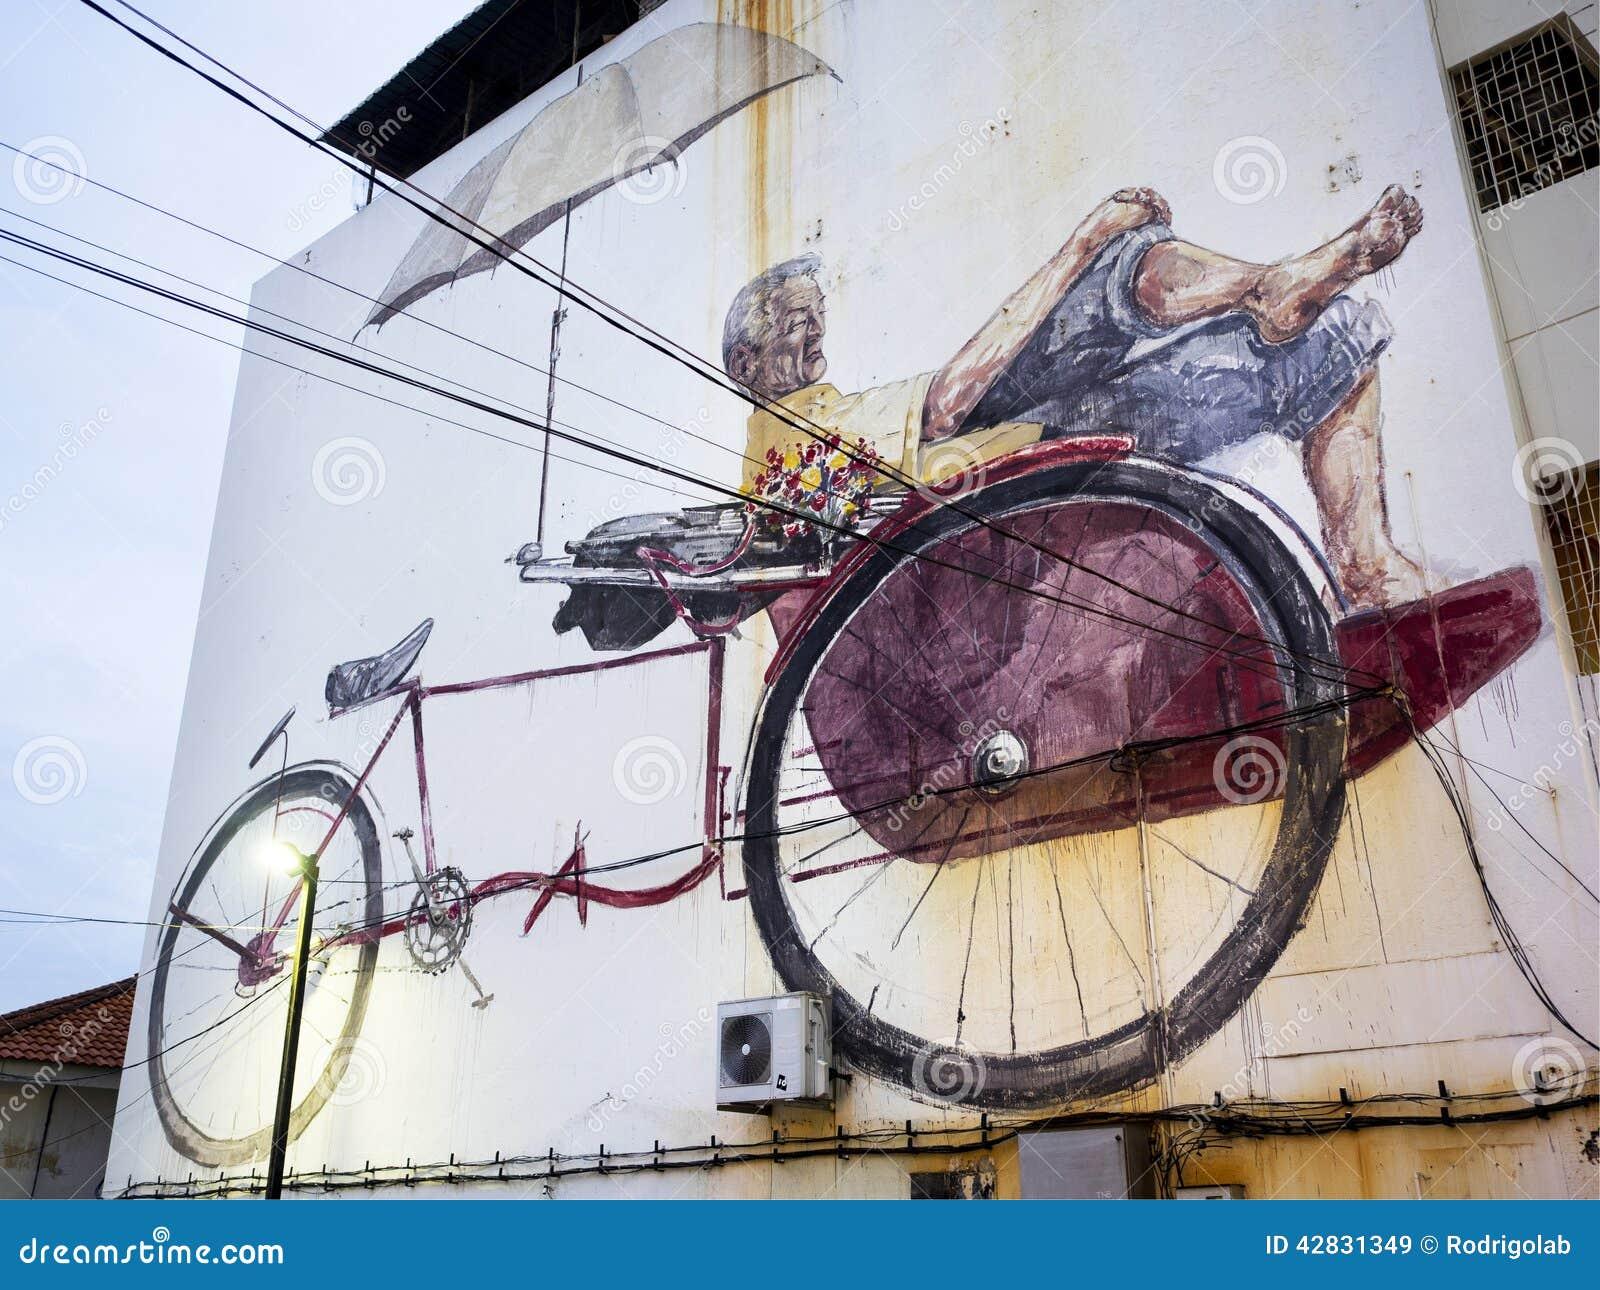 Massive street art mural in georgetown penang malaysia for Mural 1 malaysia negaraku